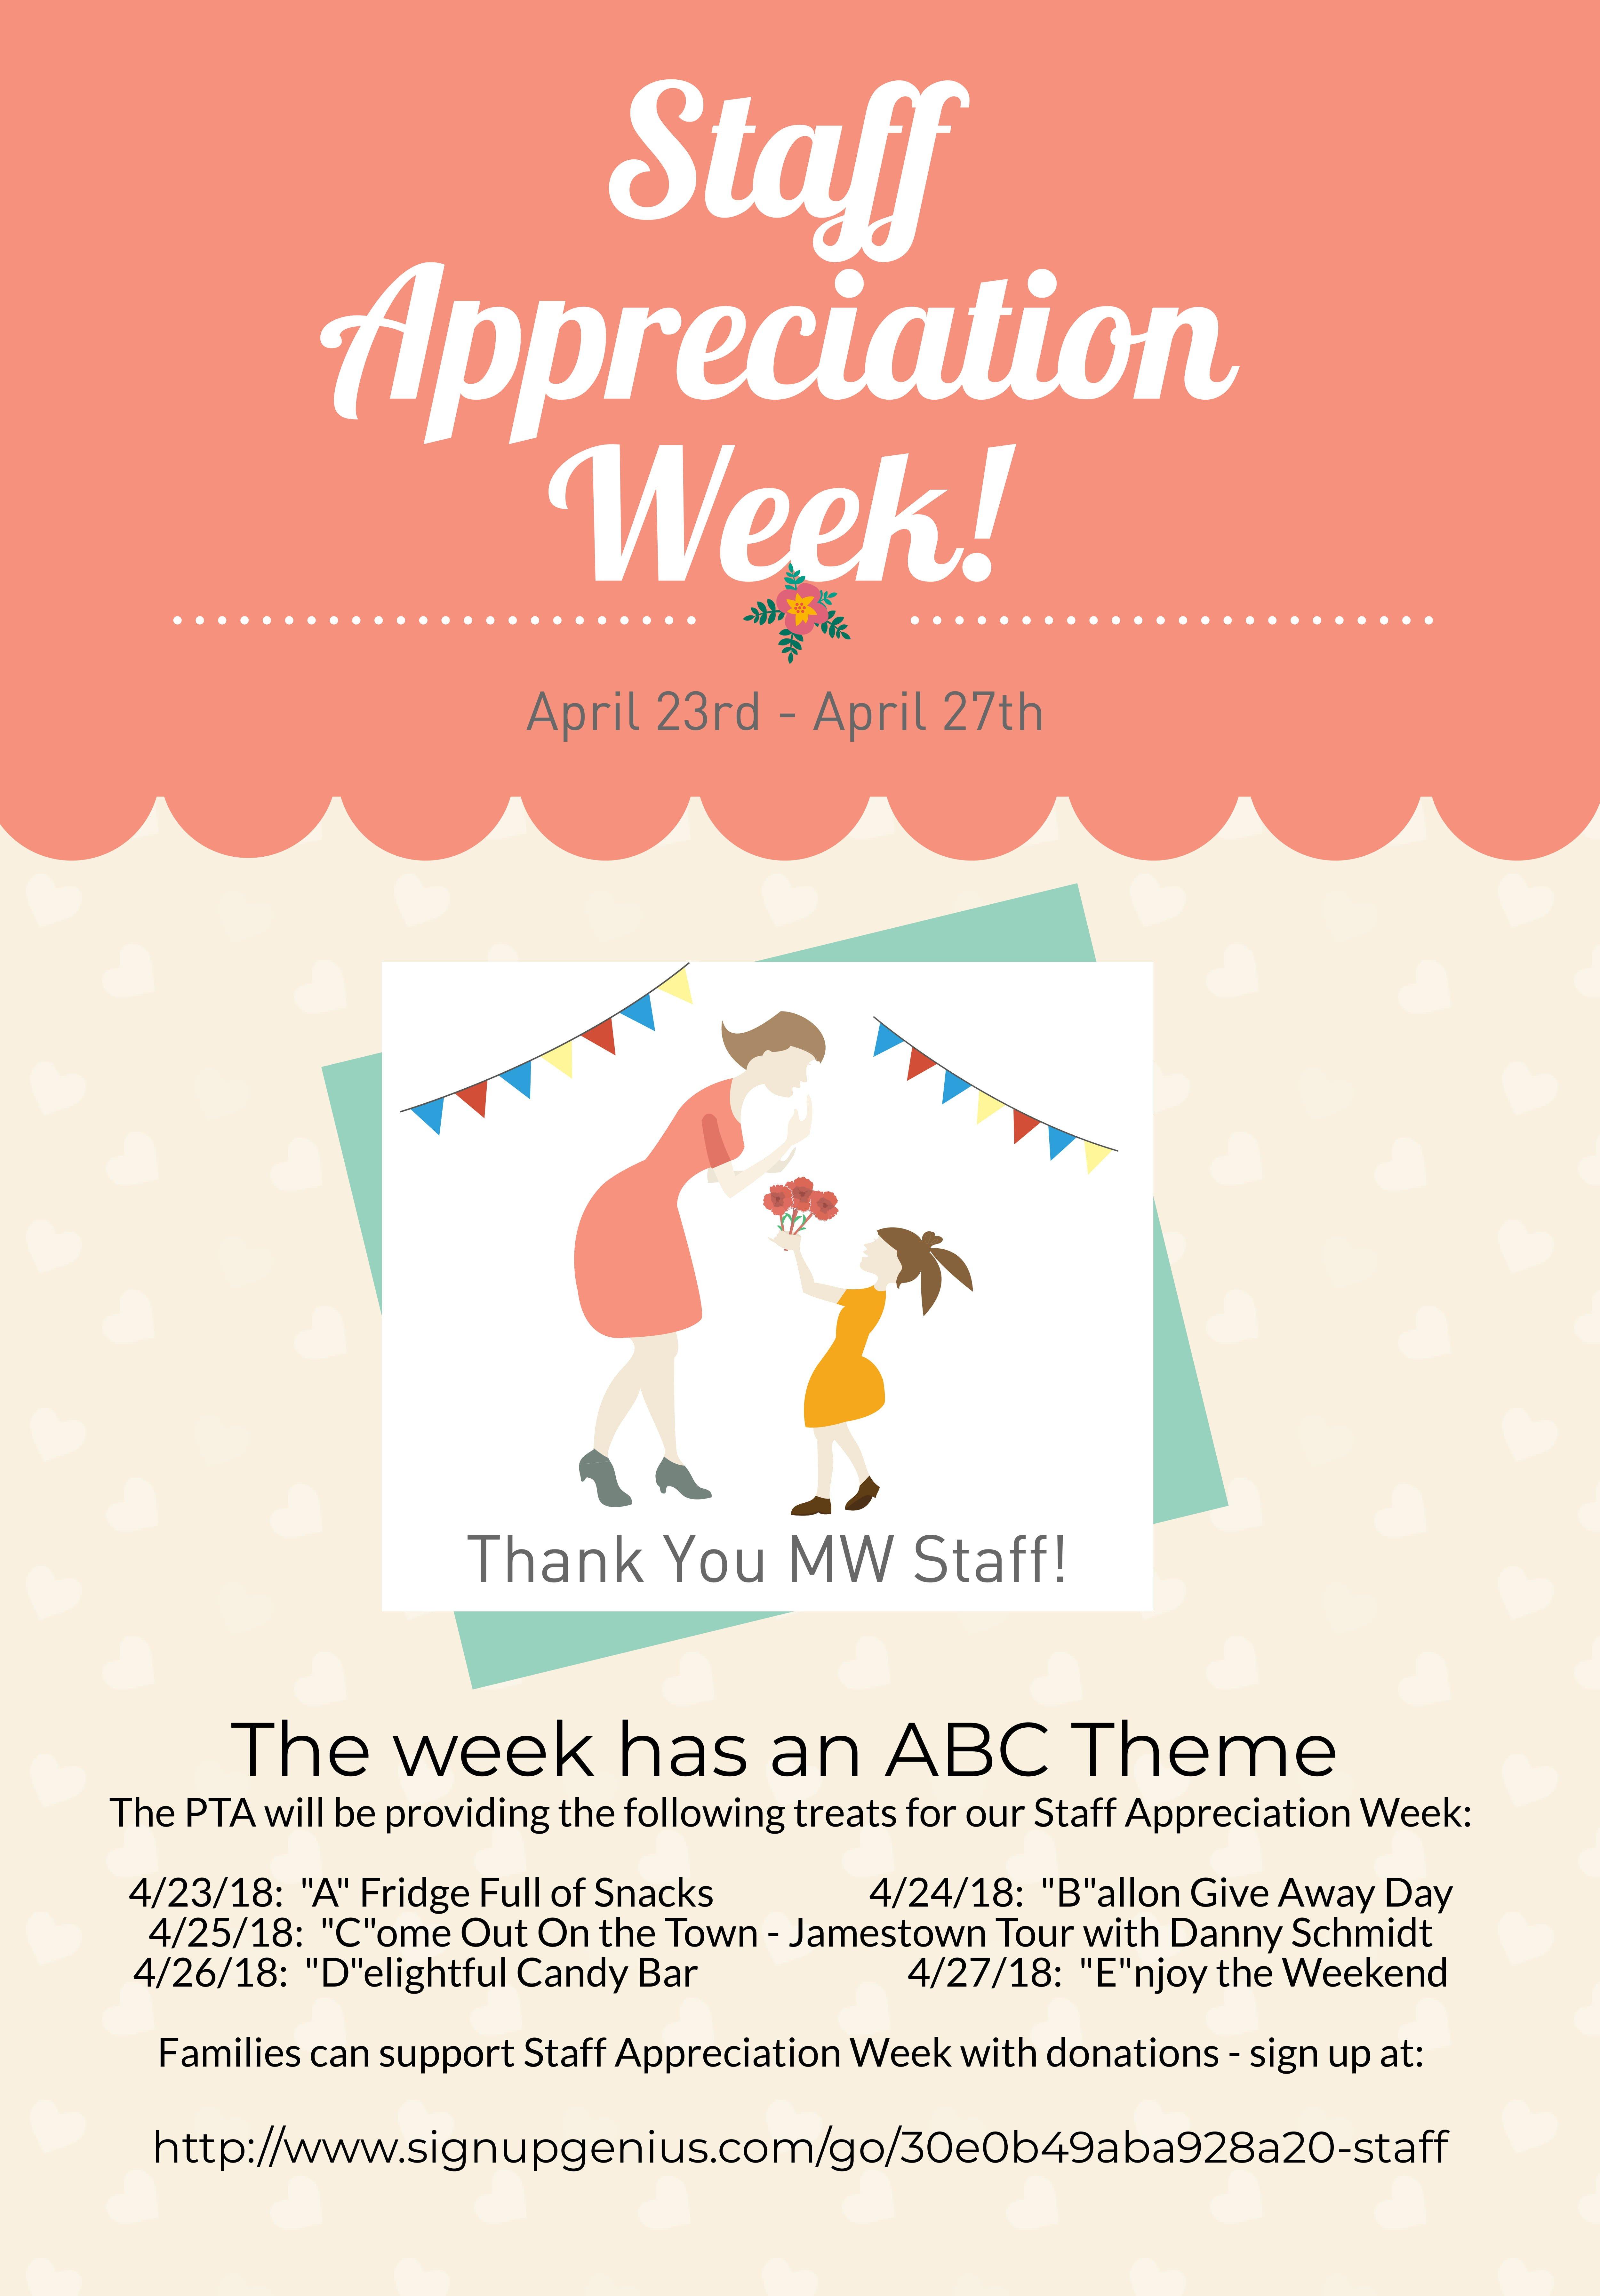 Employee Appreciation Day Flyer Template Staff Appreciation Week April 23 27 – Matthew Whaley